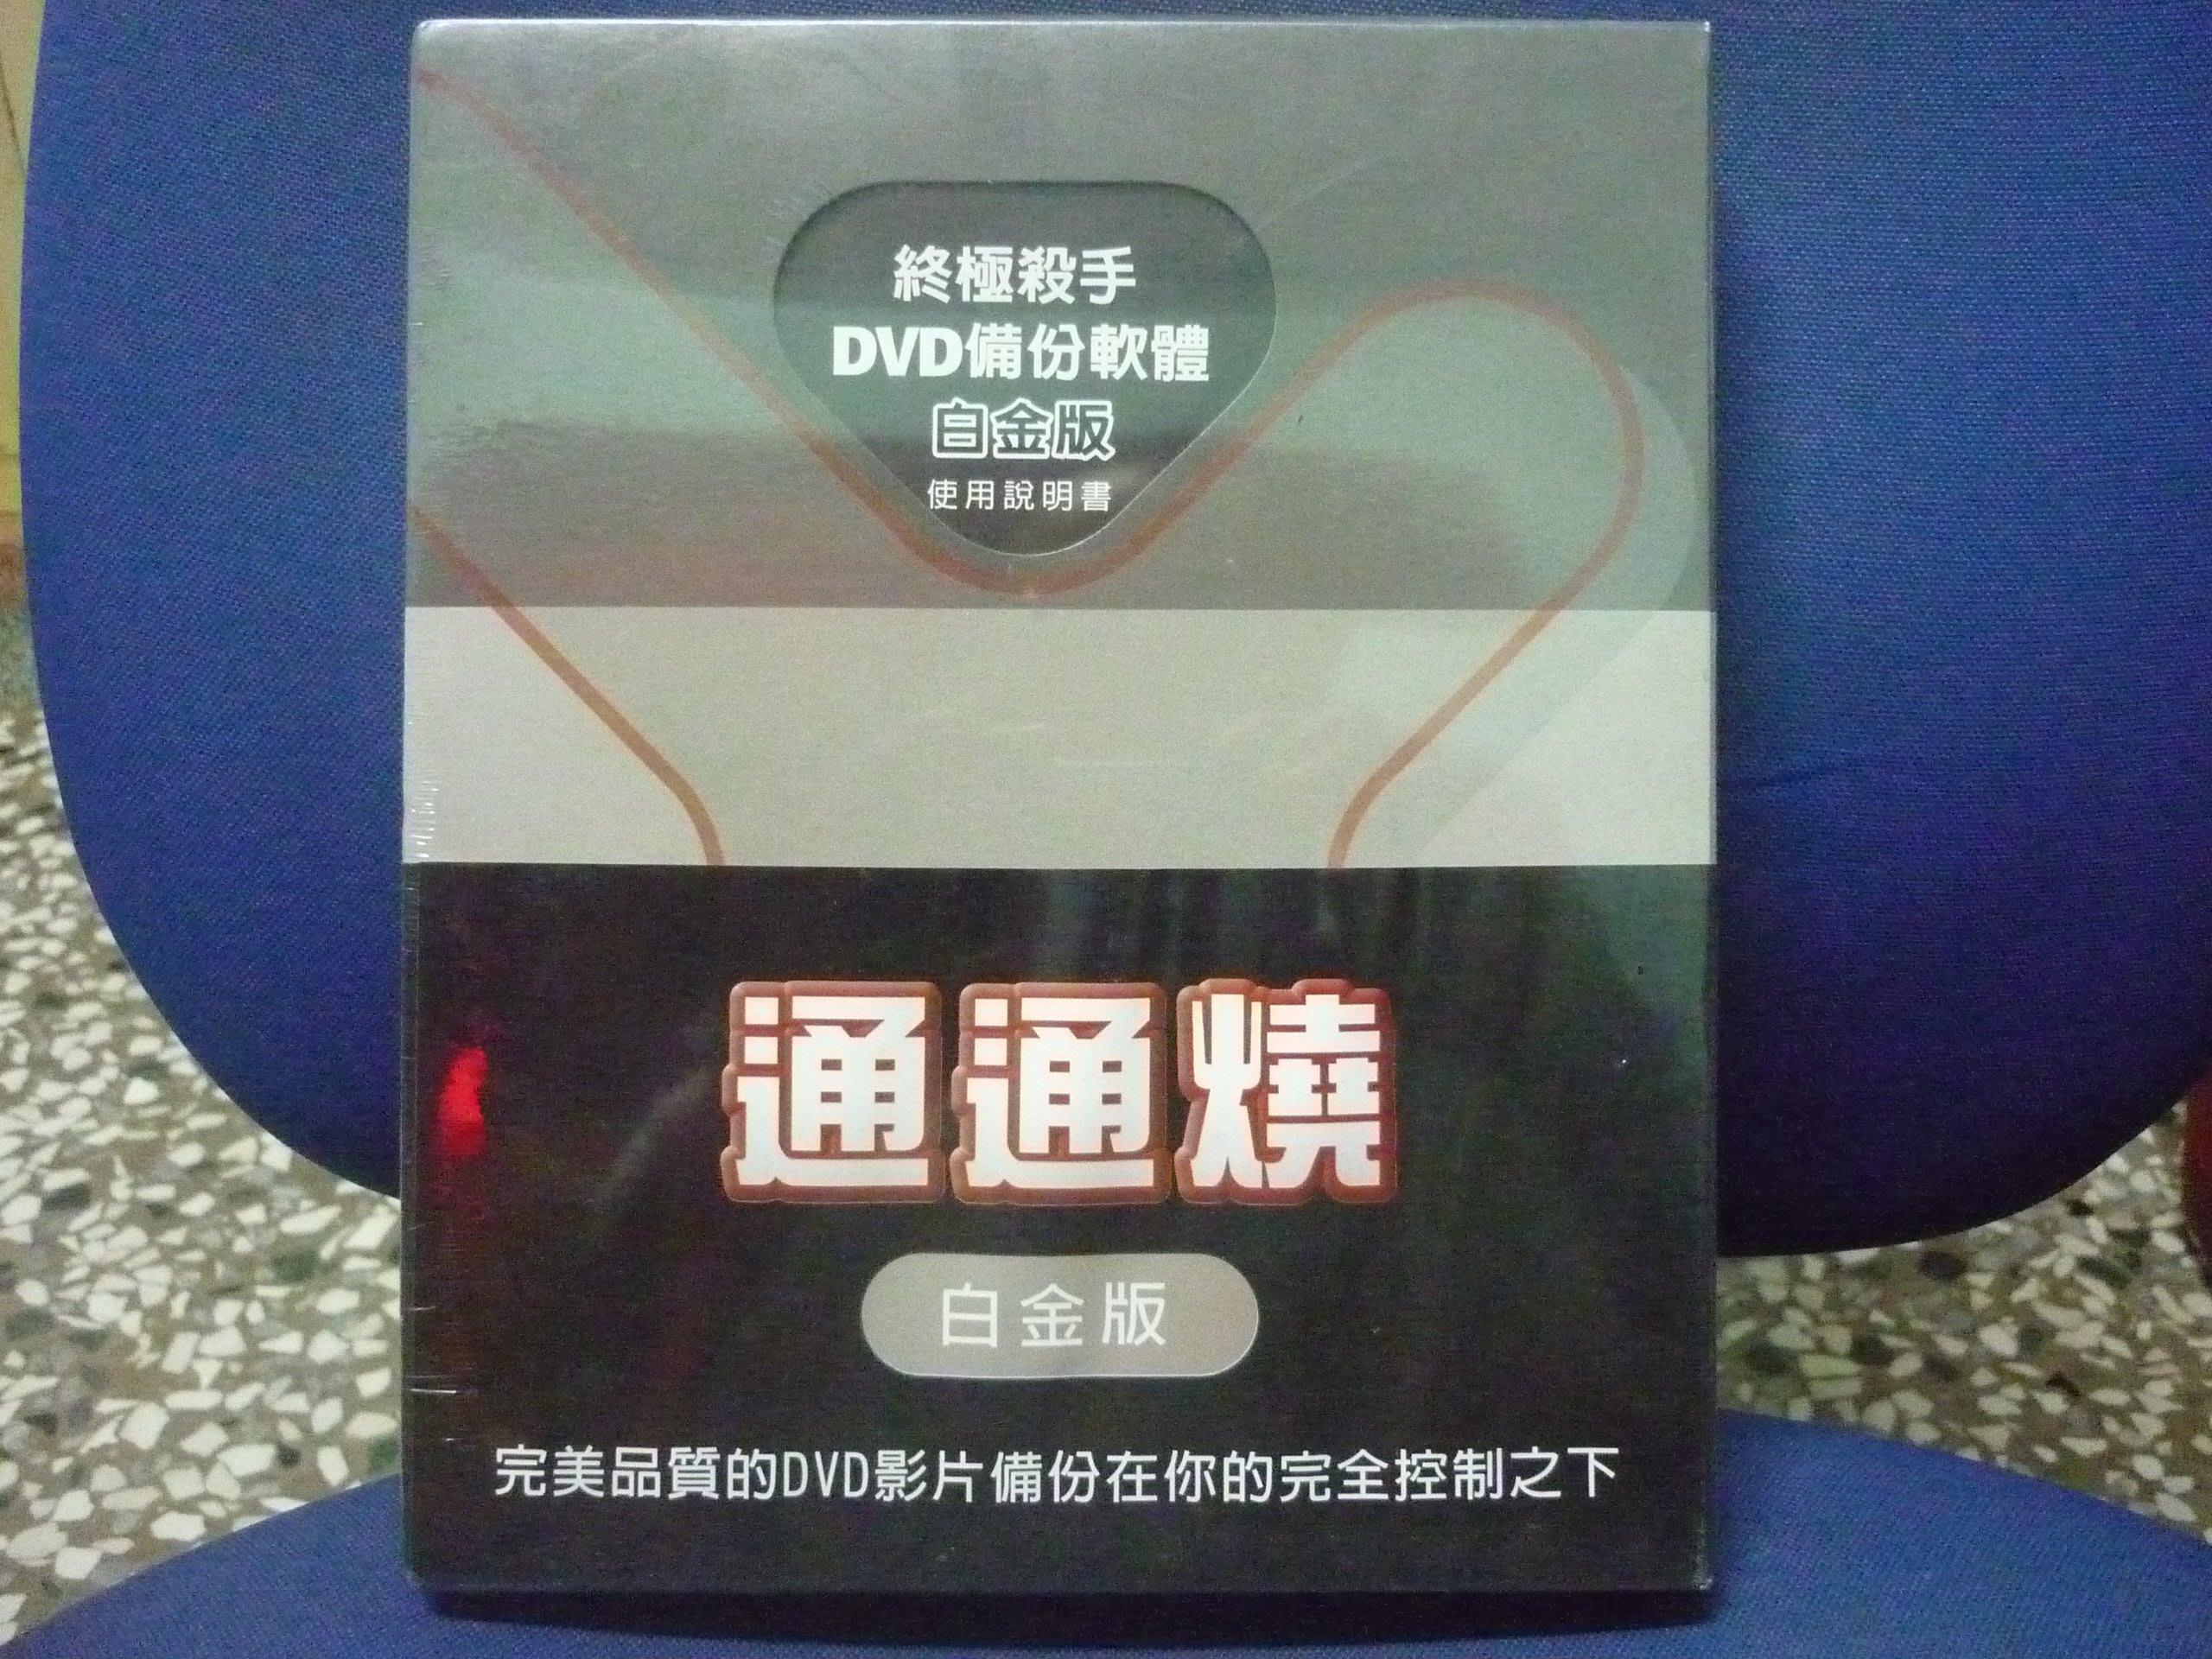 (゚Д゚)♛⛄ [2F區] (絕版) 通通燒白金版-DVD備份軟體-下標即得標♛ (ゝ∀・)